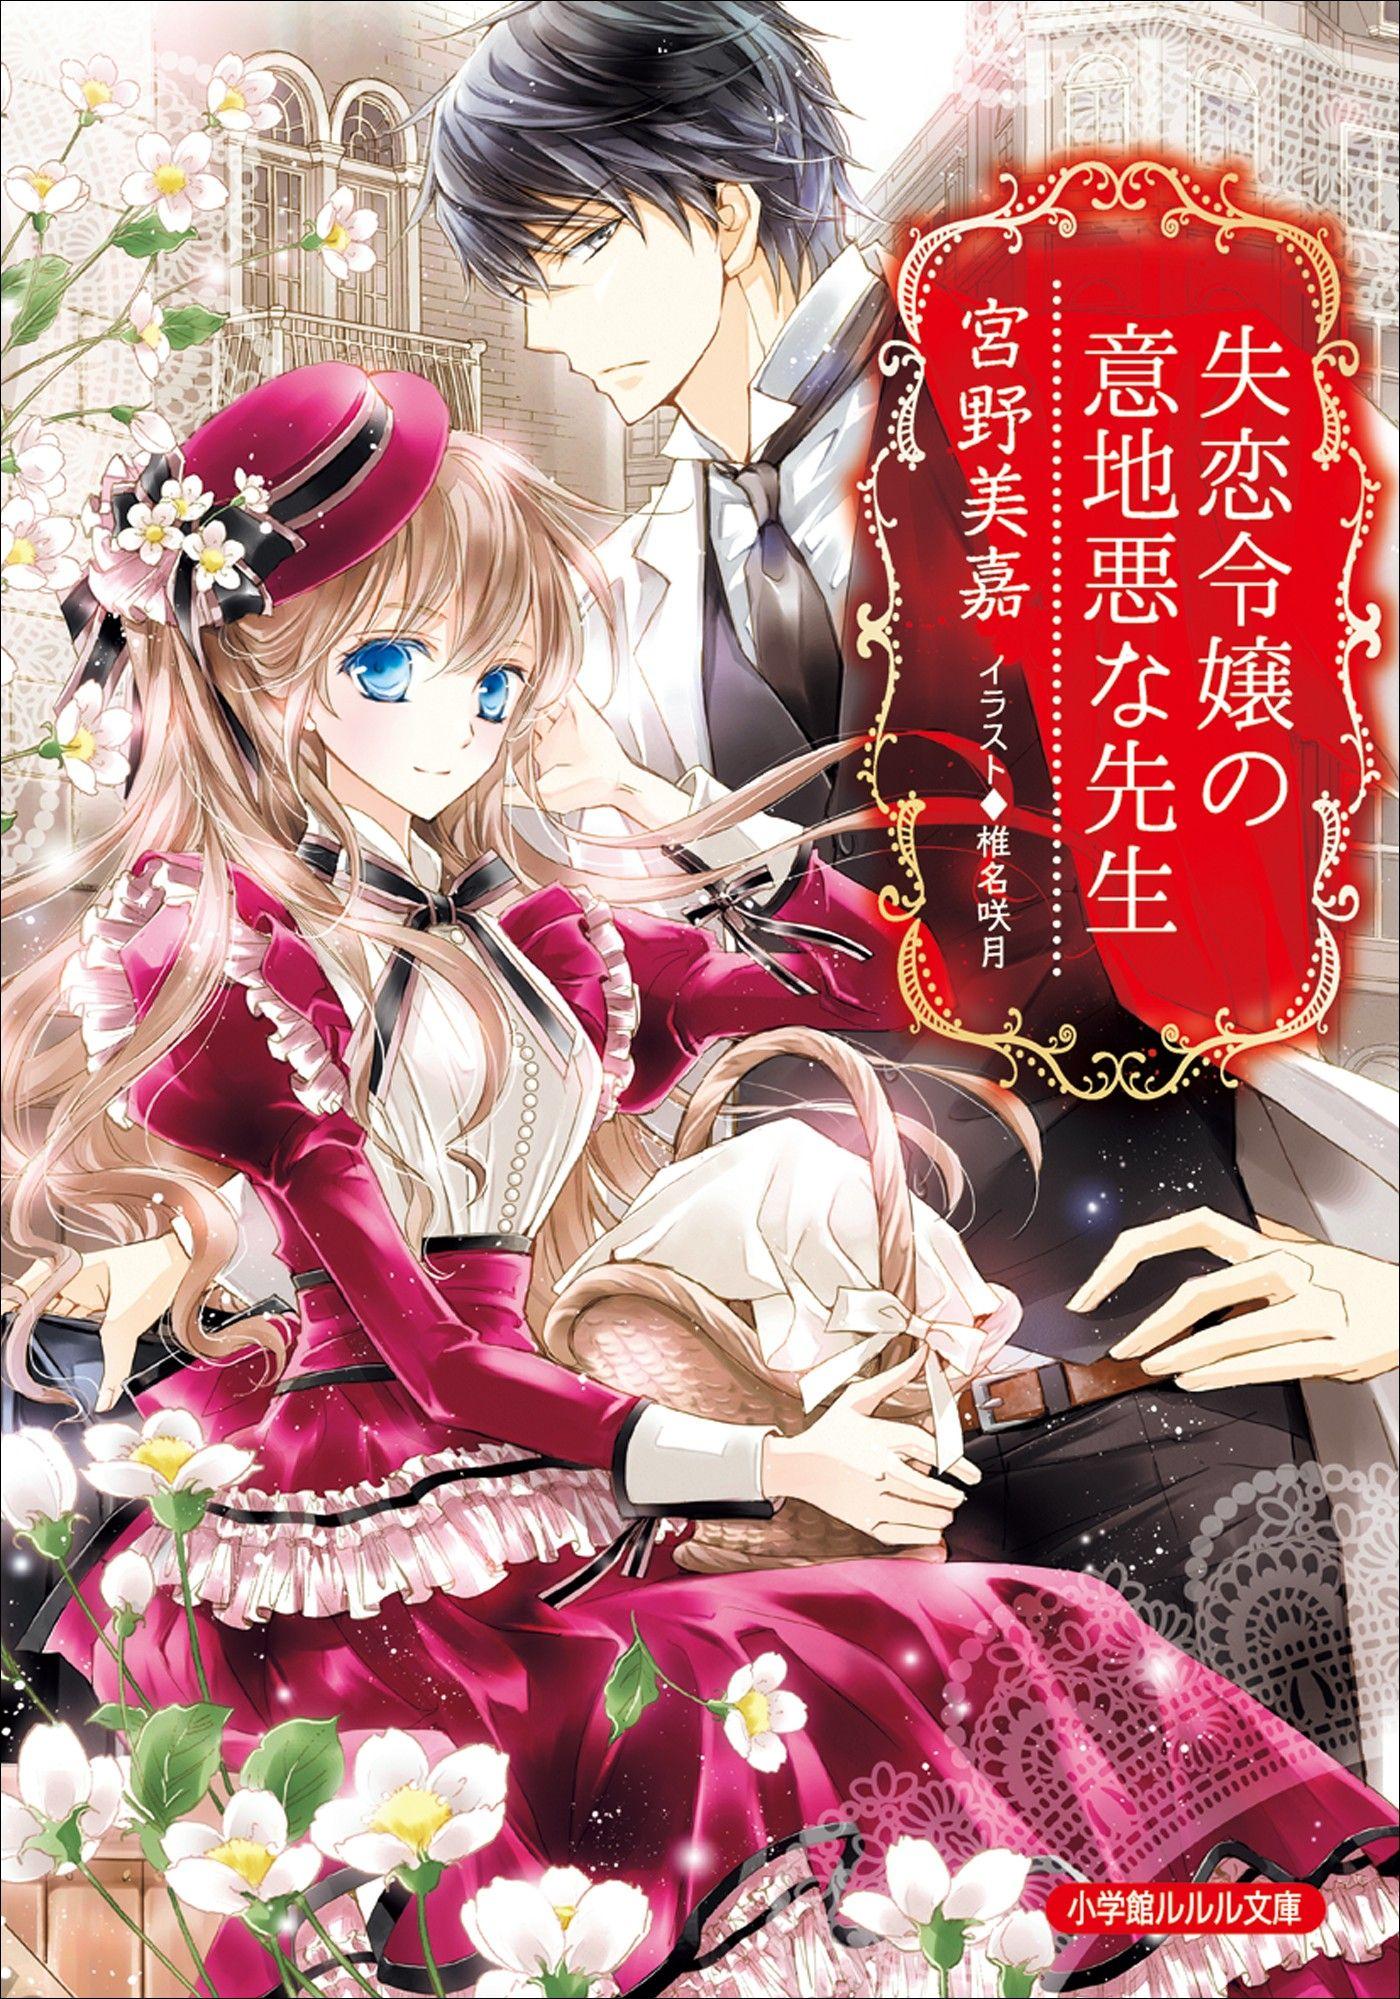 Pin by mero on Me Anime chibi, Anime love, Romantic manga